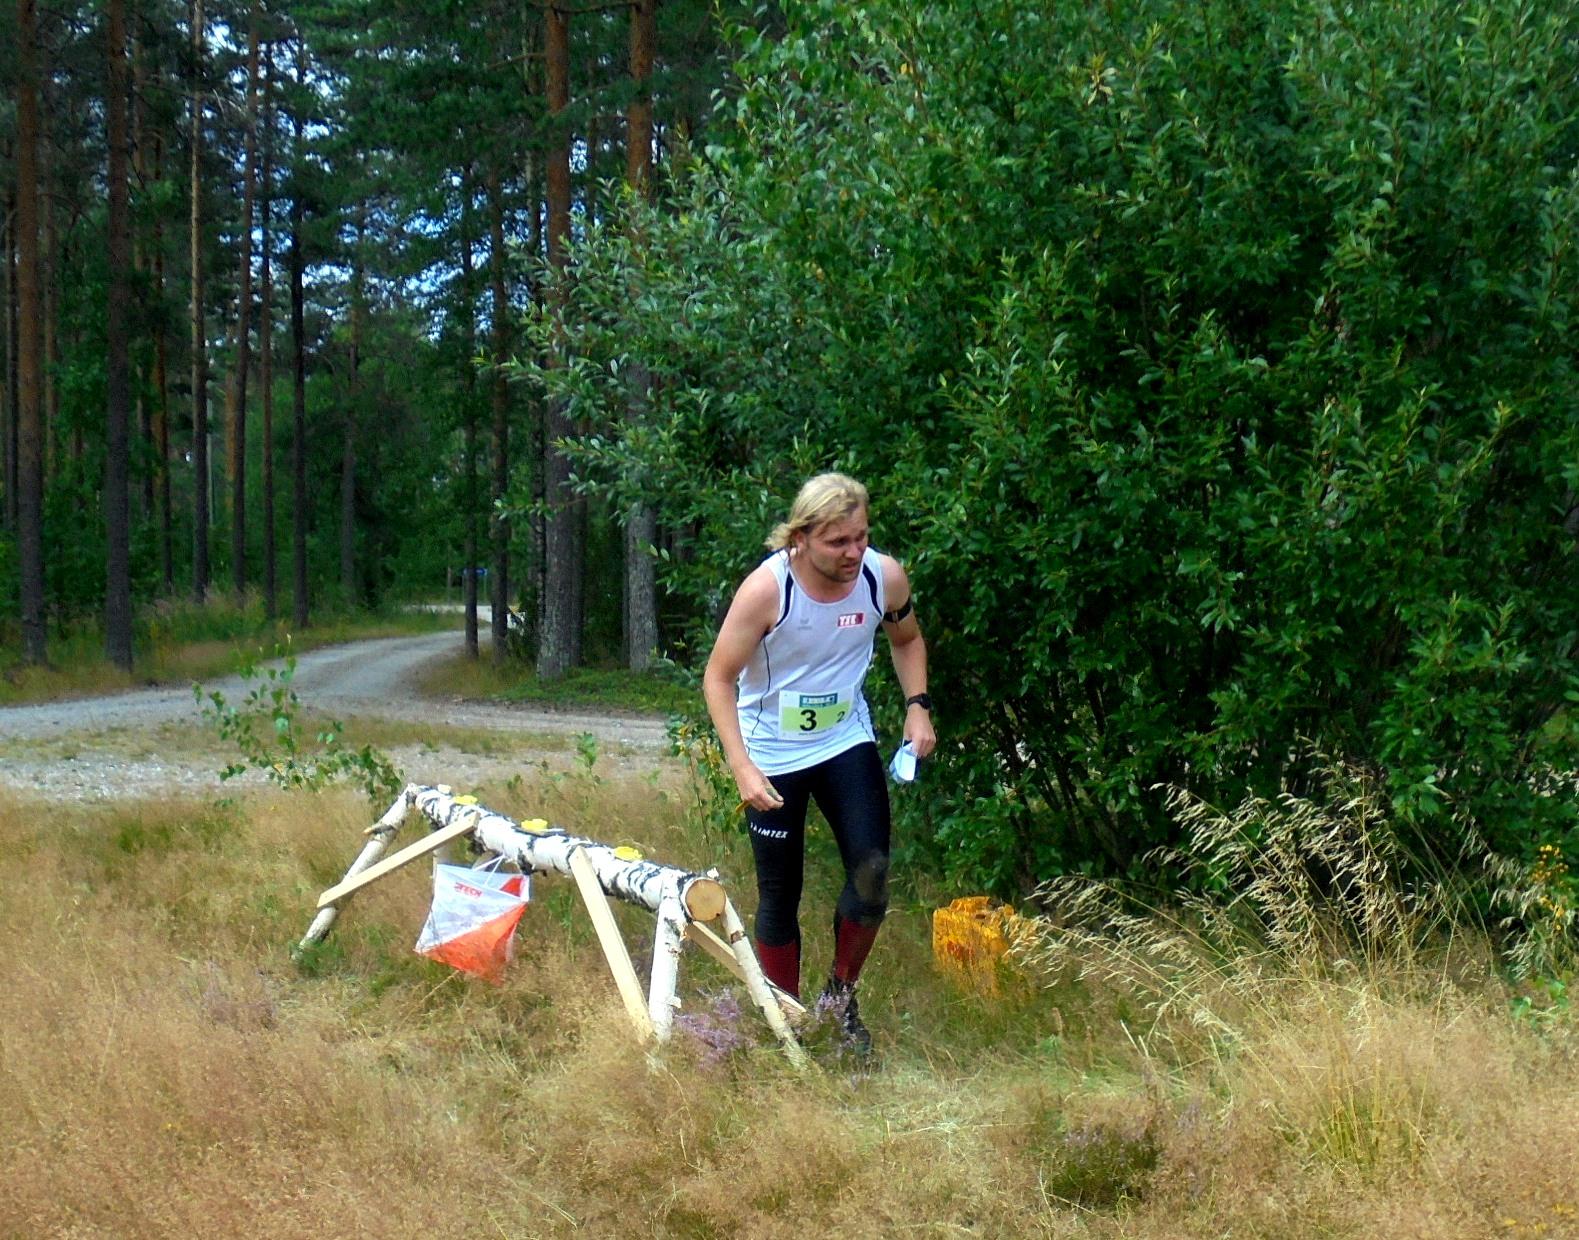 wm-in-biathlon-ol-10.jpg